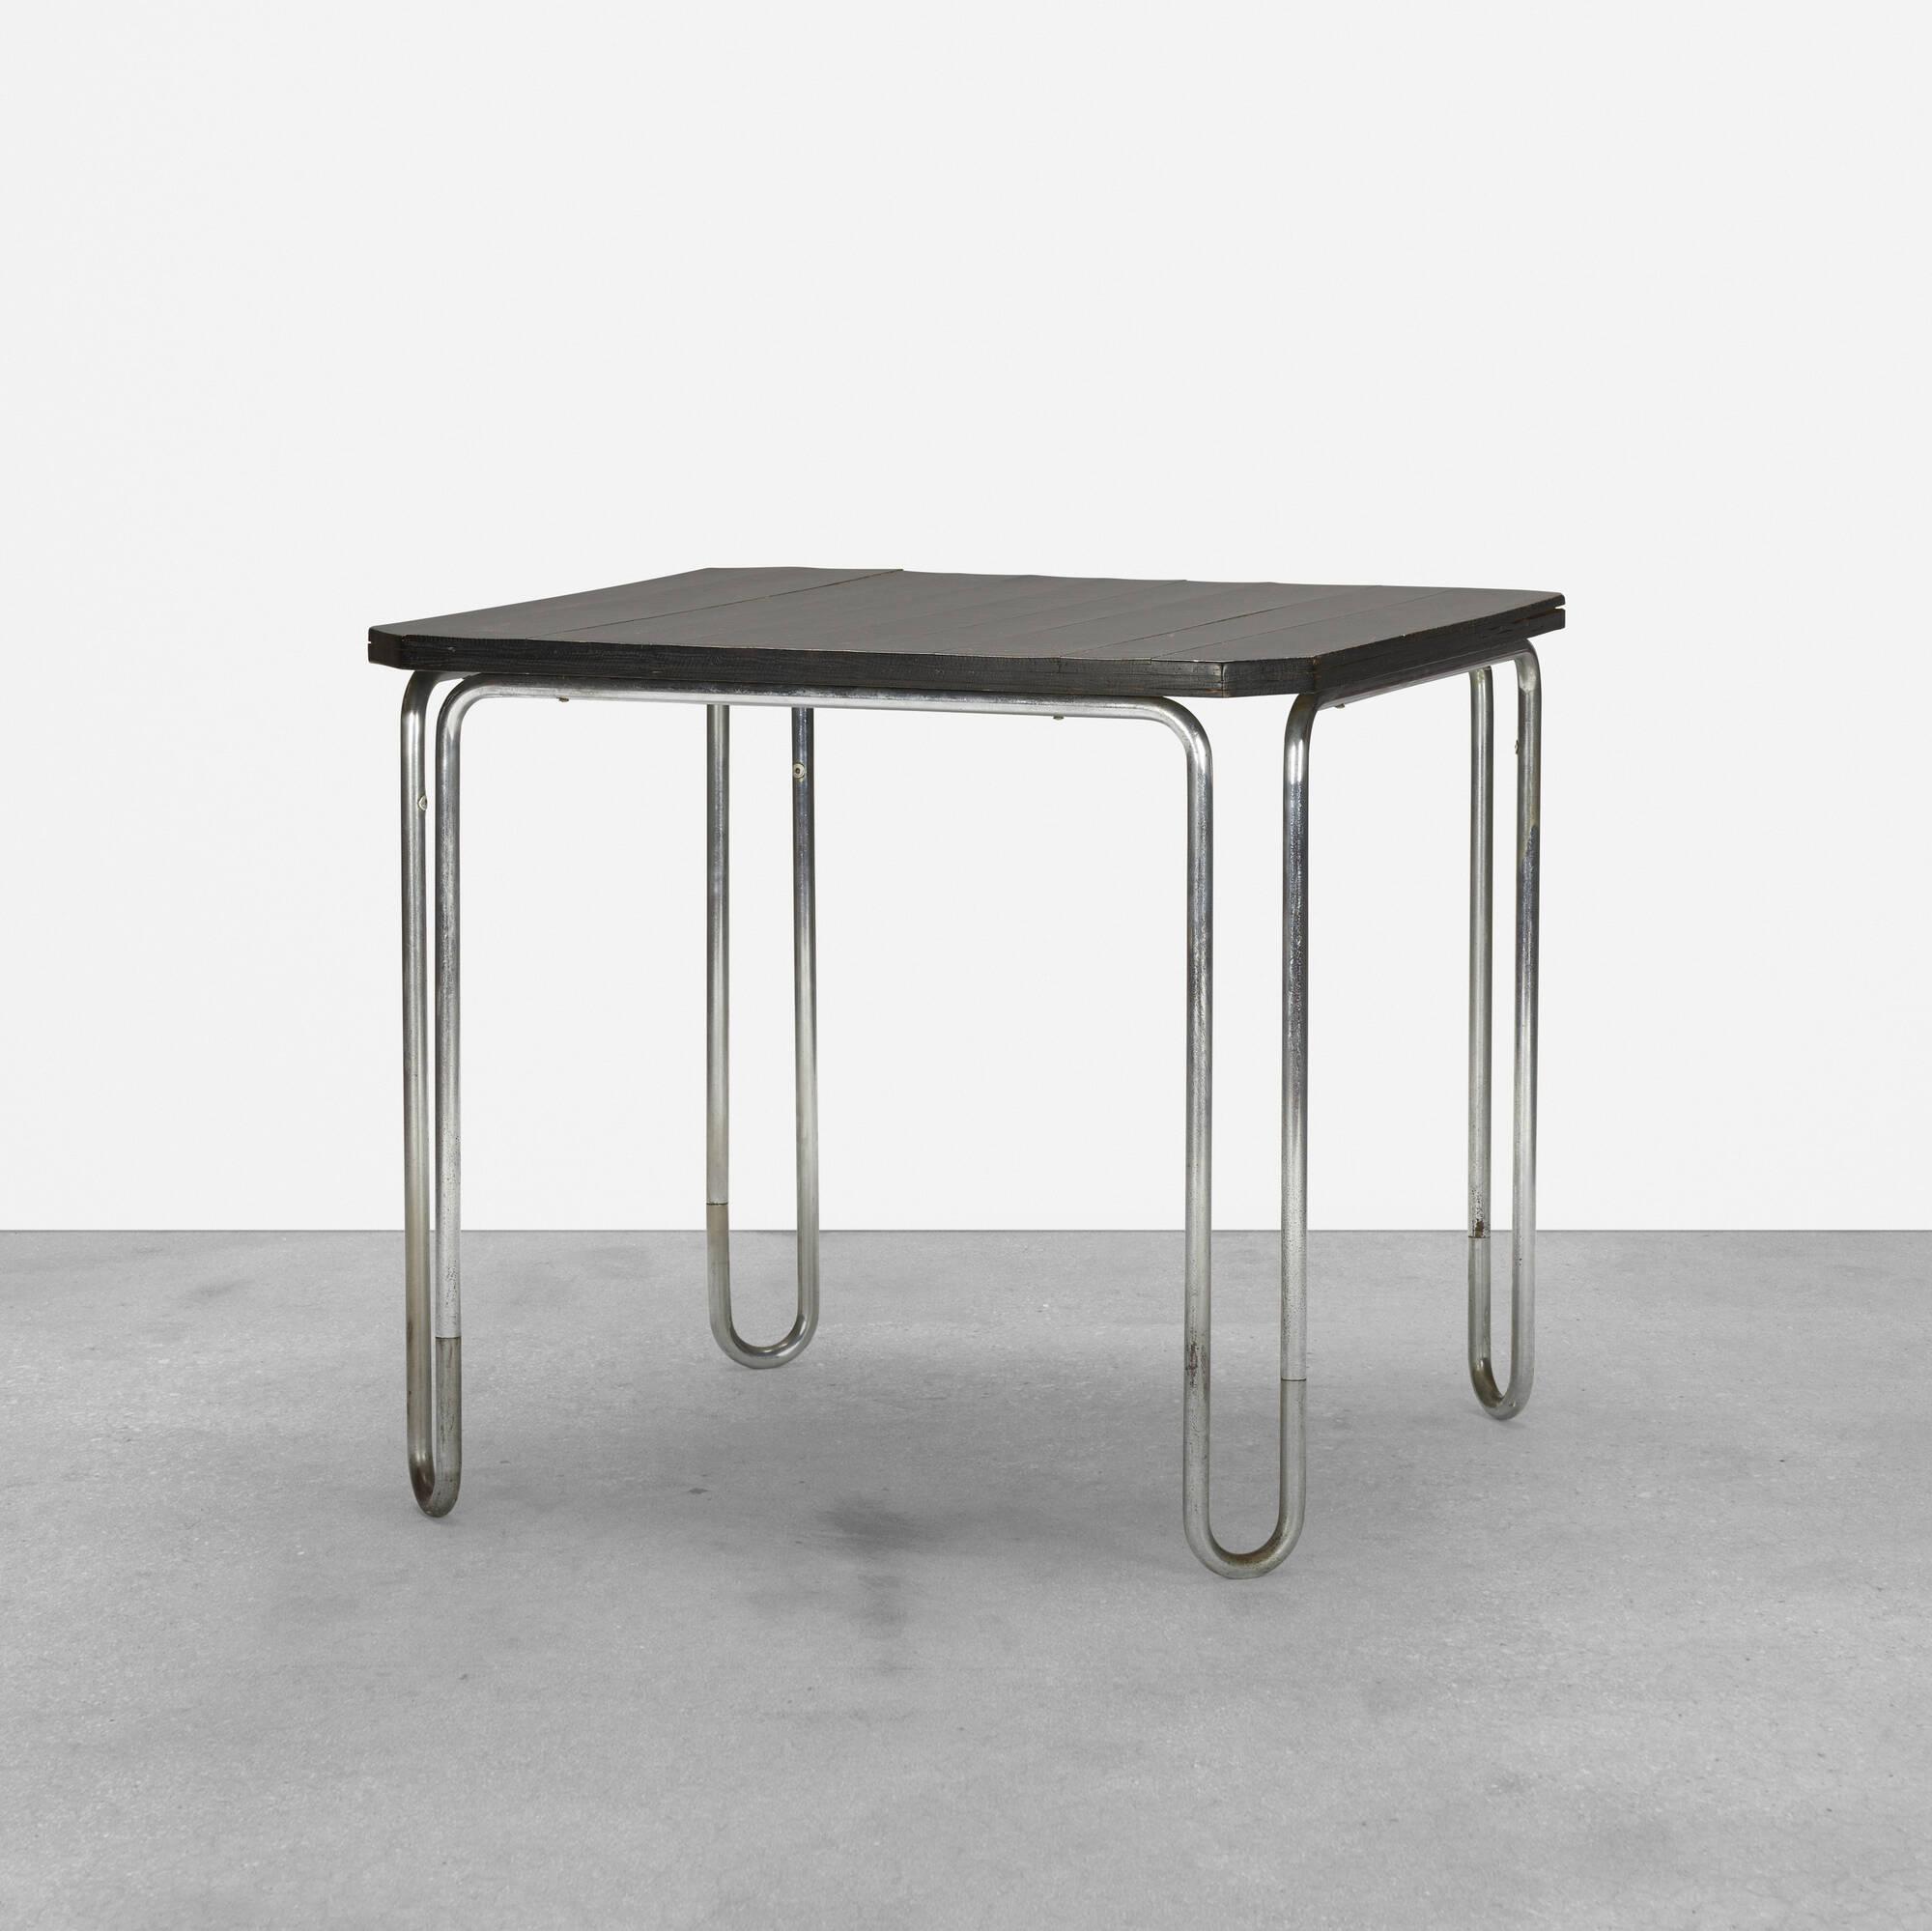 146: Marcel Breuer / table, model B10 (1 of 3)